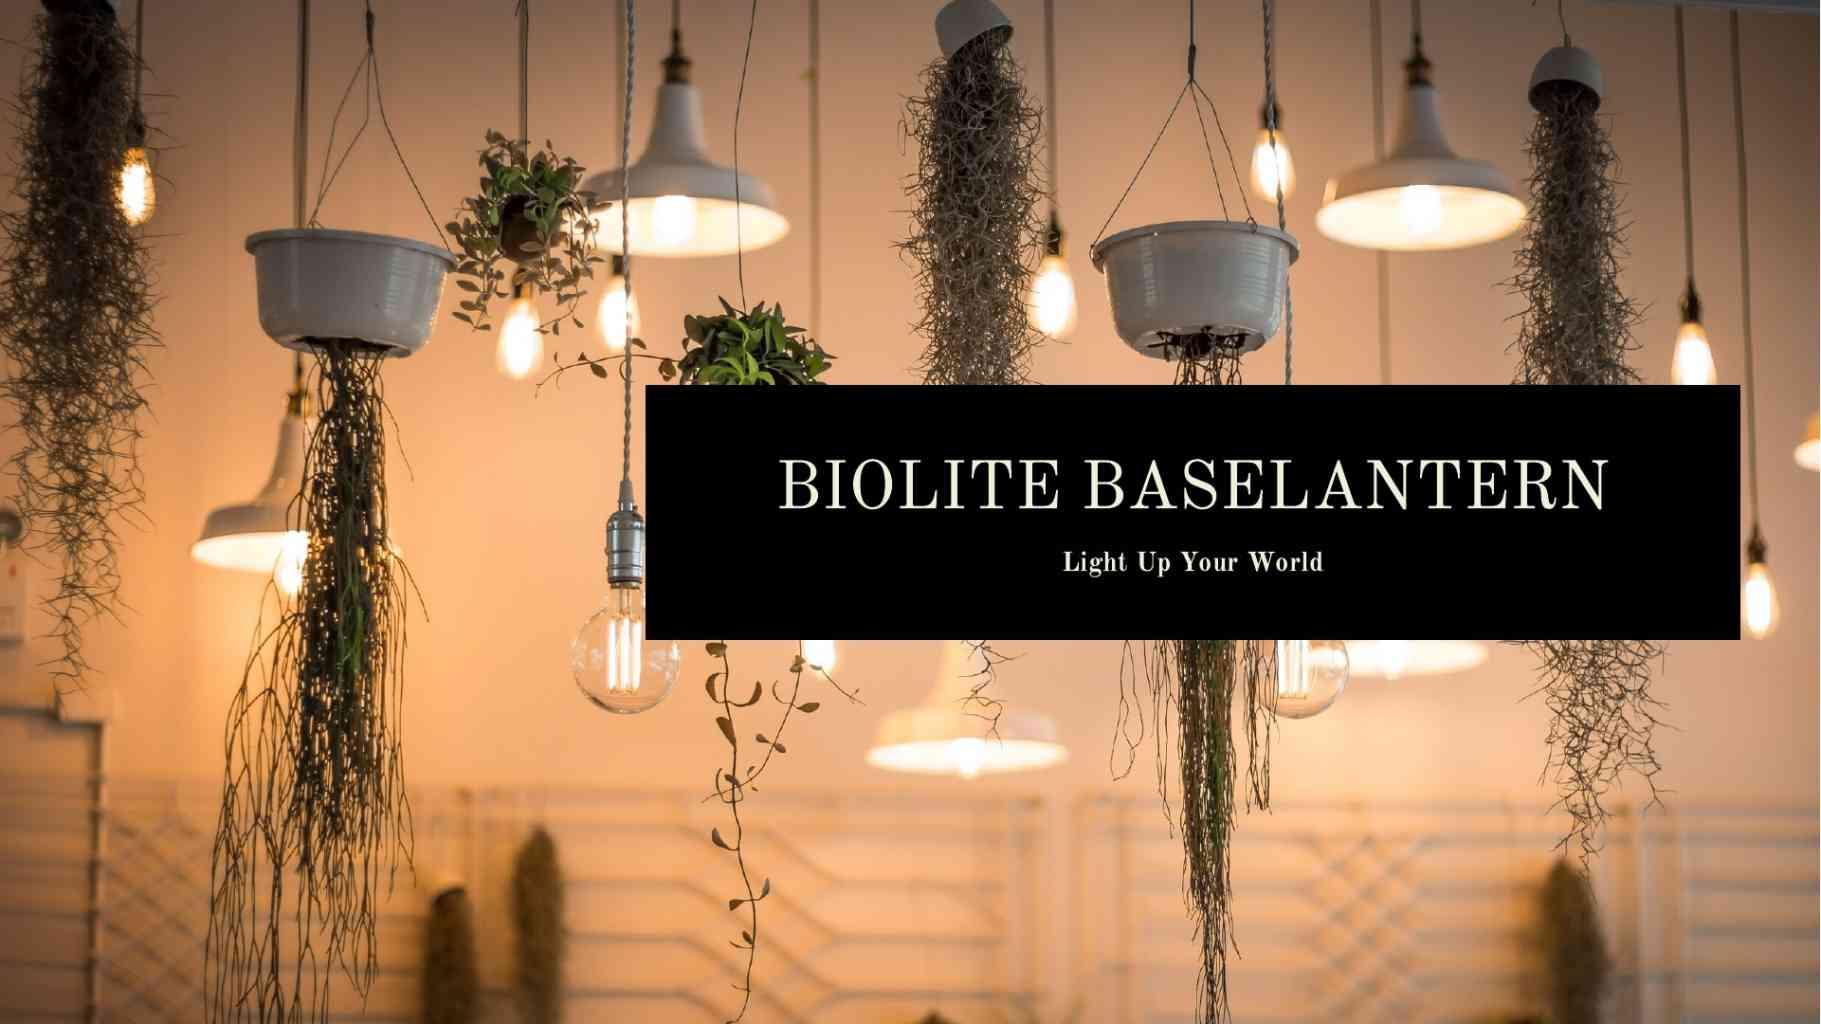 Biolite Baselantern – Light Up Your World